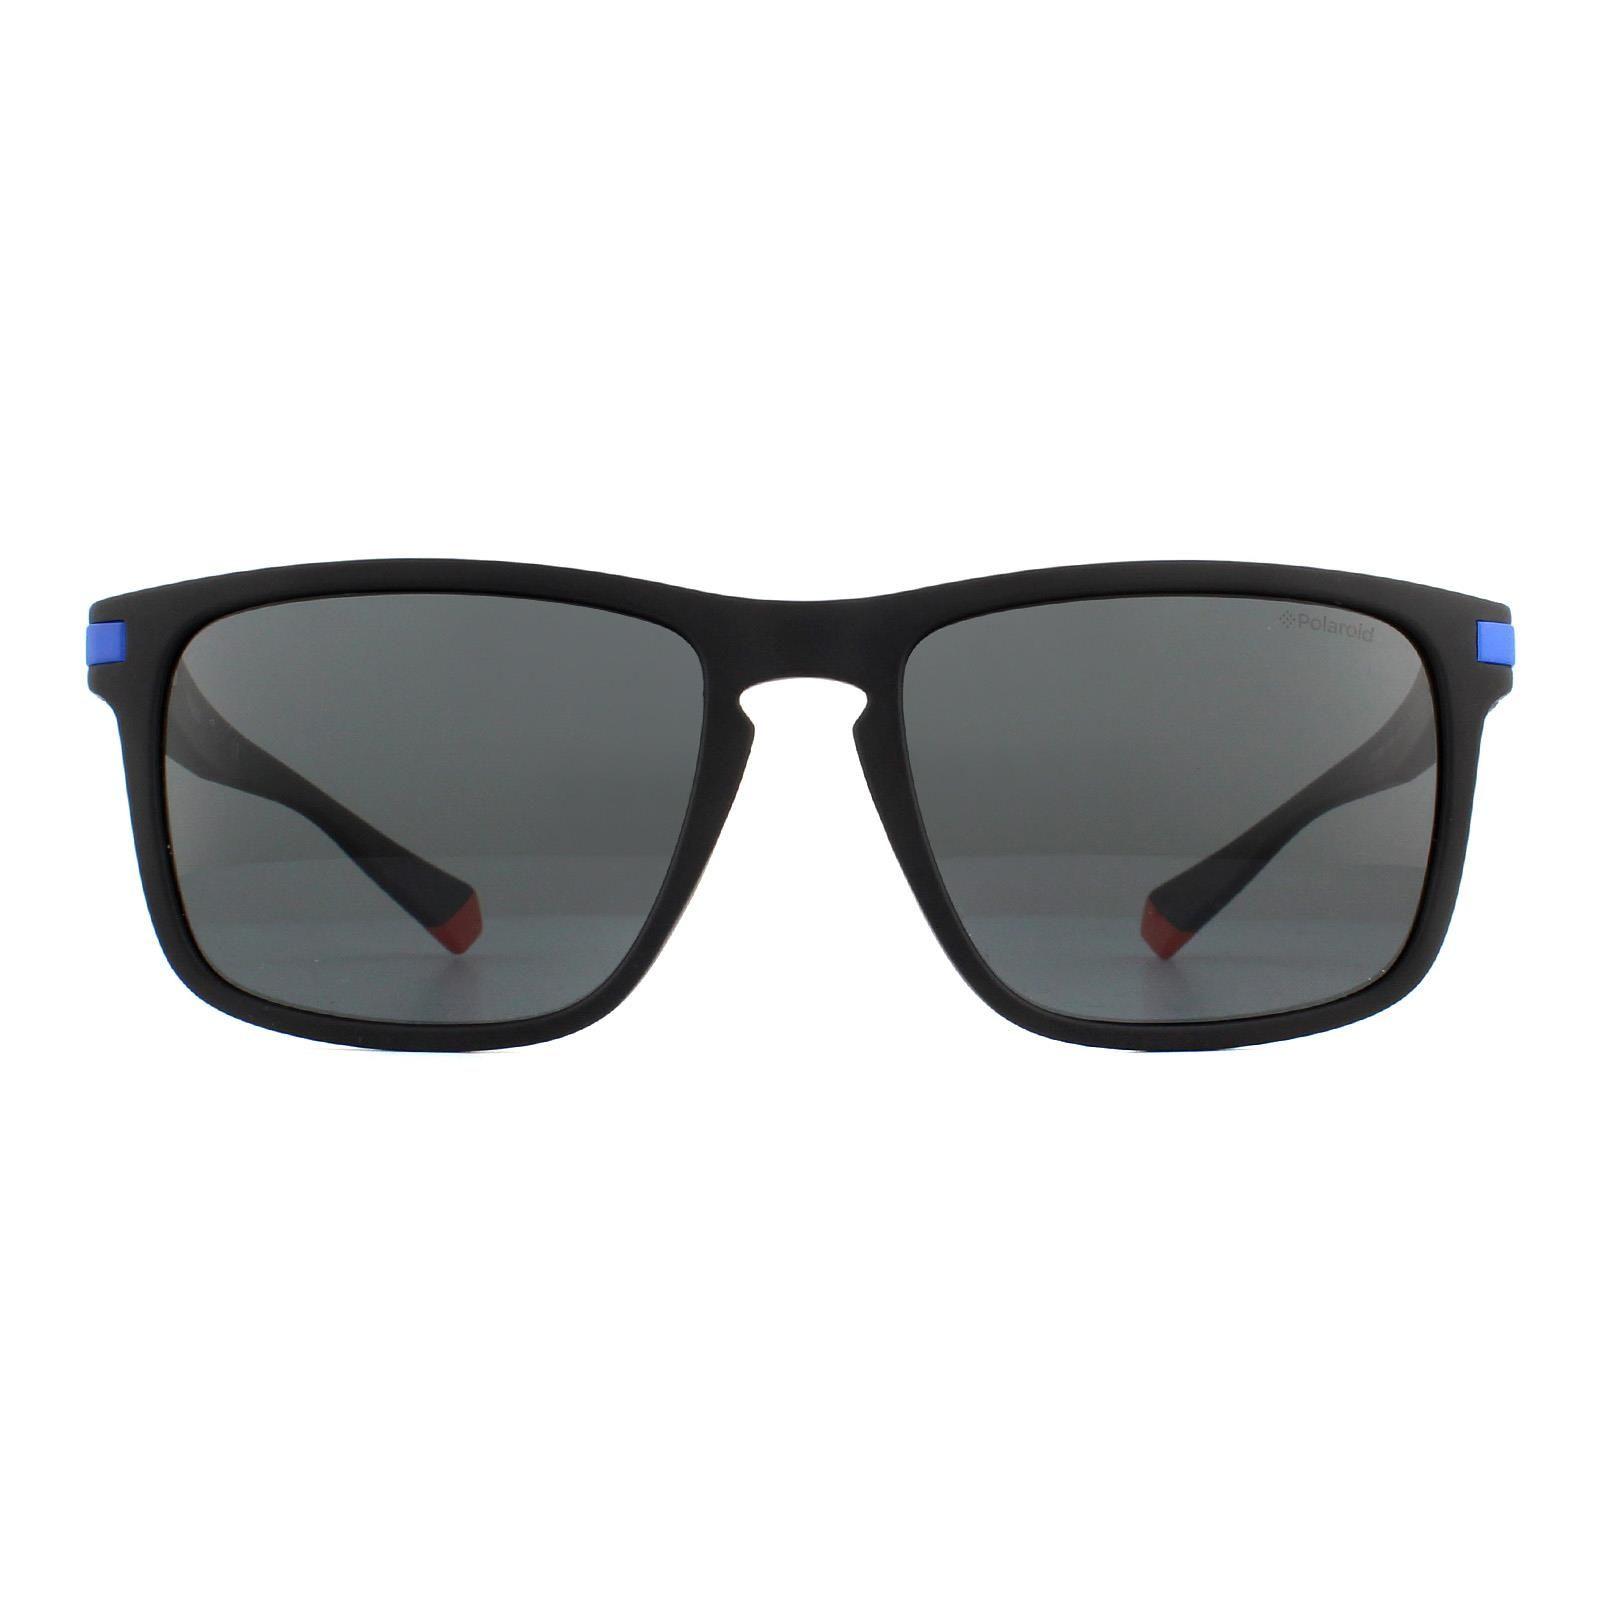 Polaroid Sunglasses PLD 2088/S 0VK M9 Matte Black Blue Grey Polarized